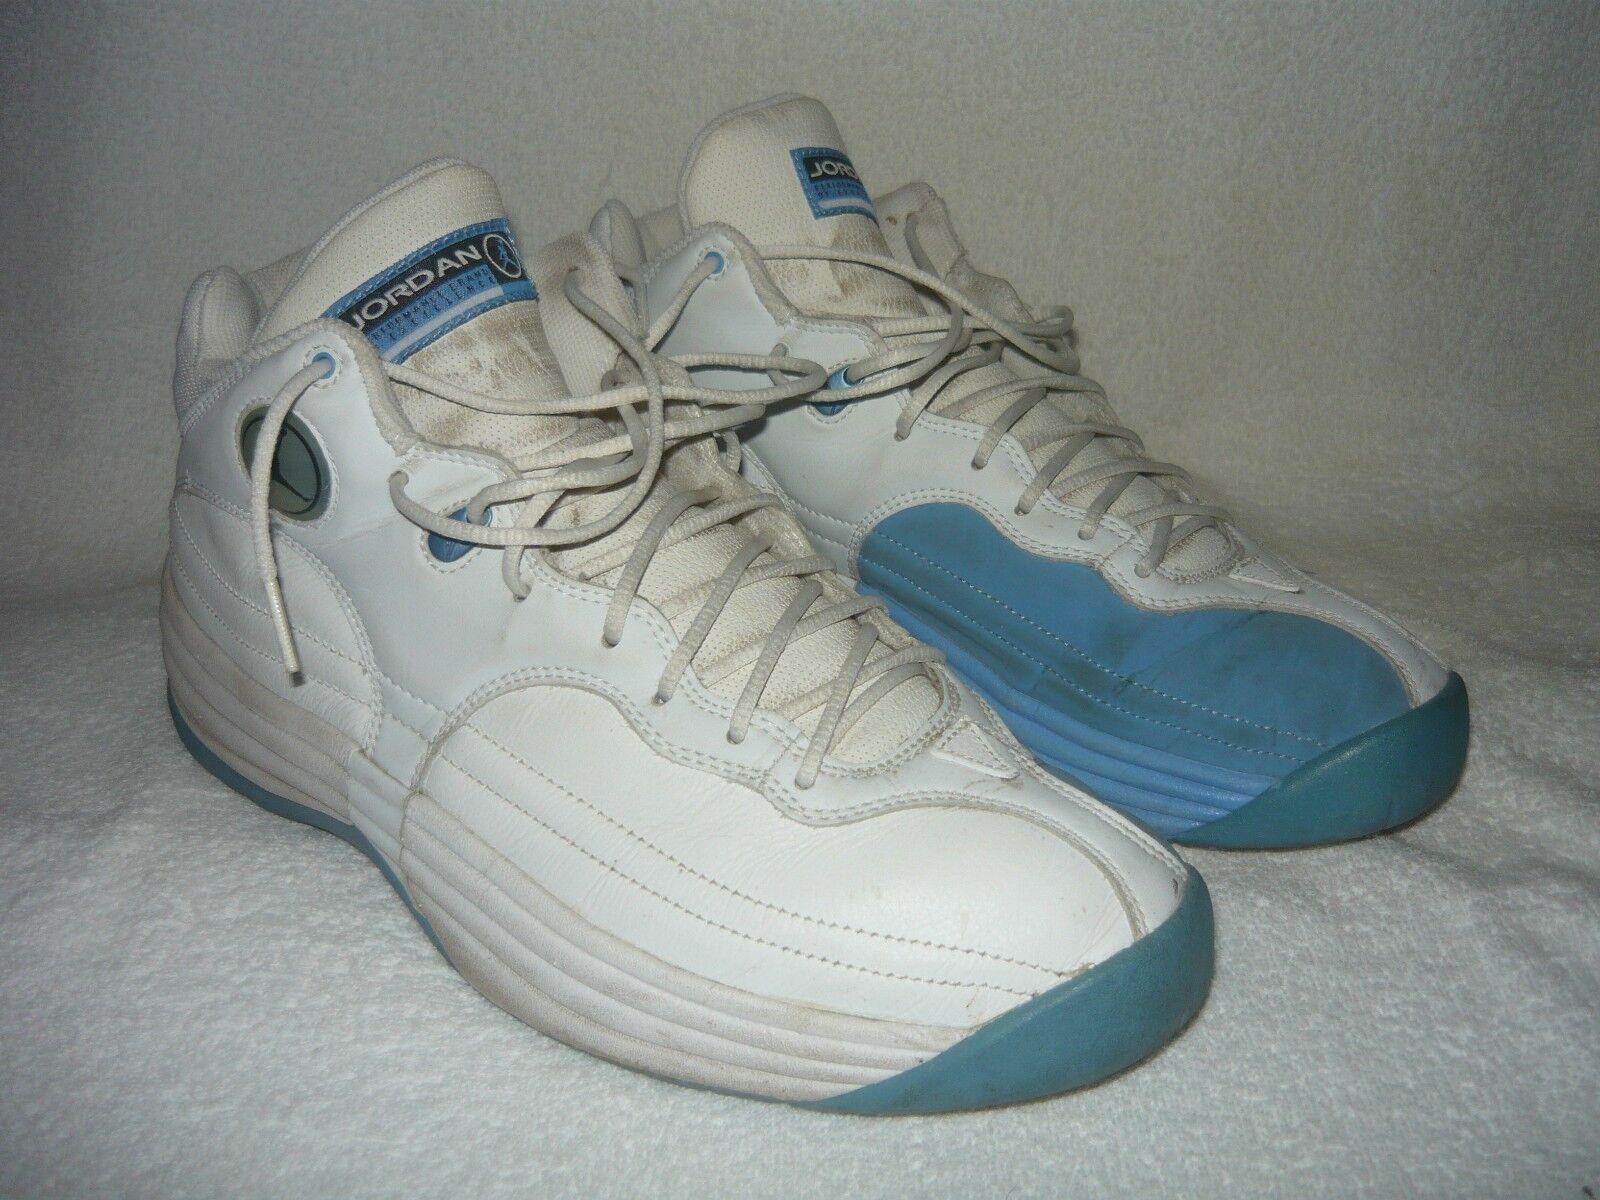 Nike Air Jordan Team 1 136003-142 2002 size 12 University Blue 2002 136003-142 North Carolina 3d13e8